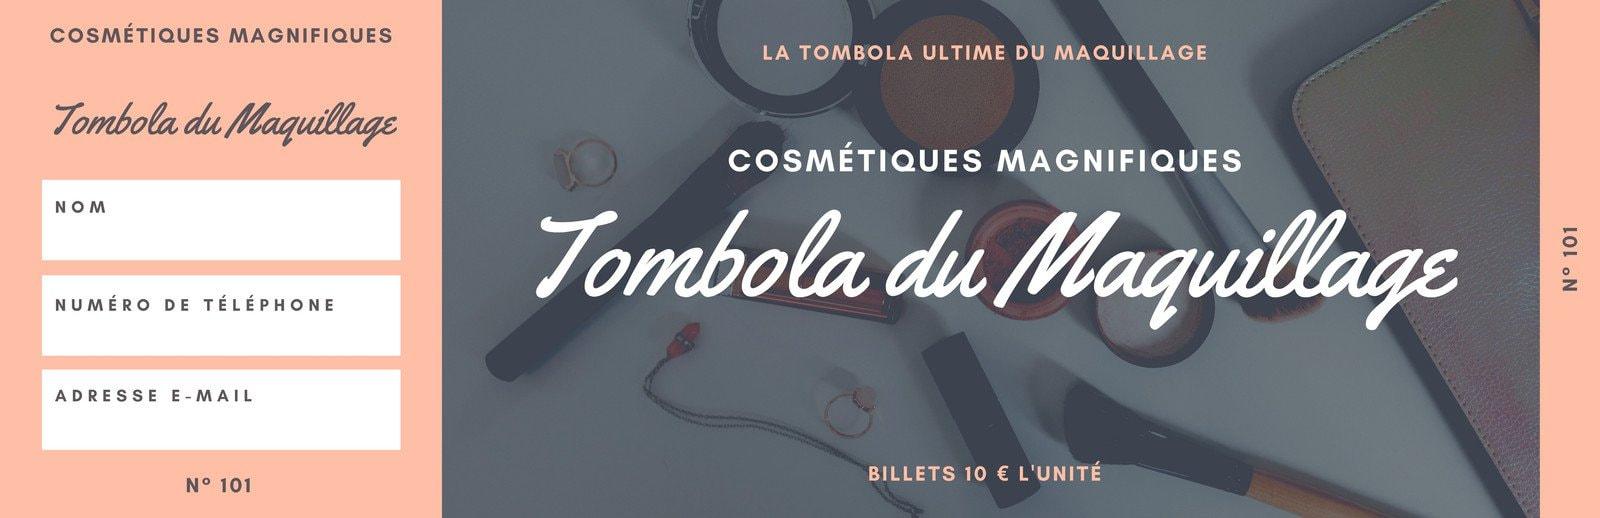 Pêche et Gris Maquillage Tombola Billet